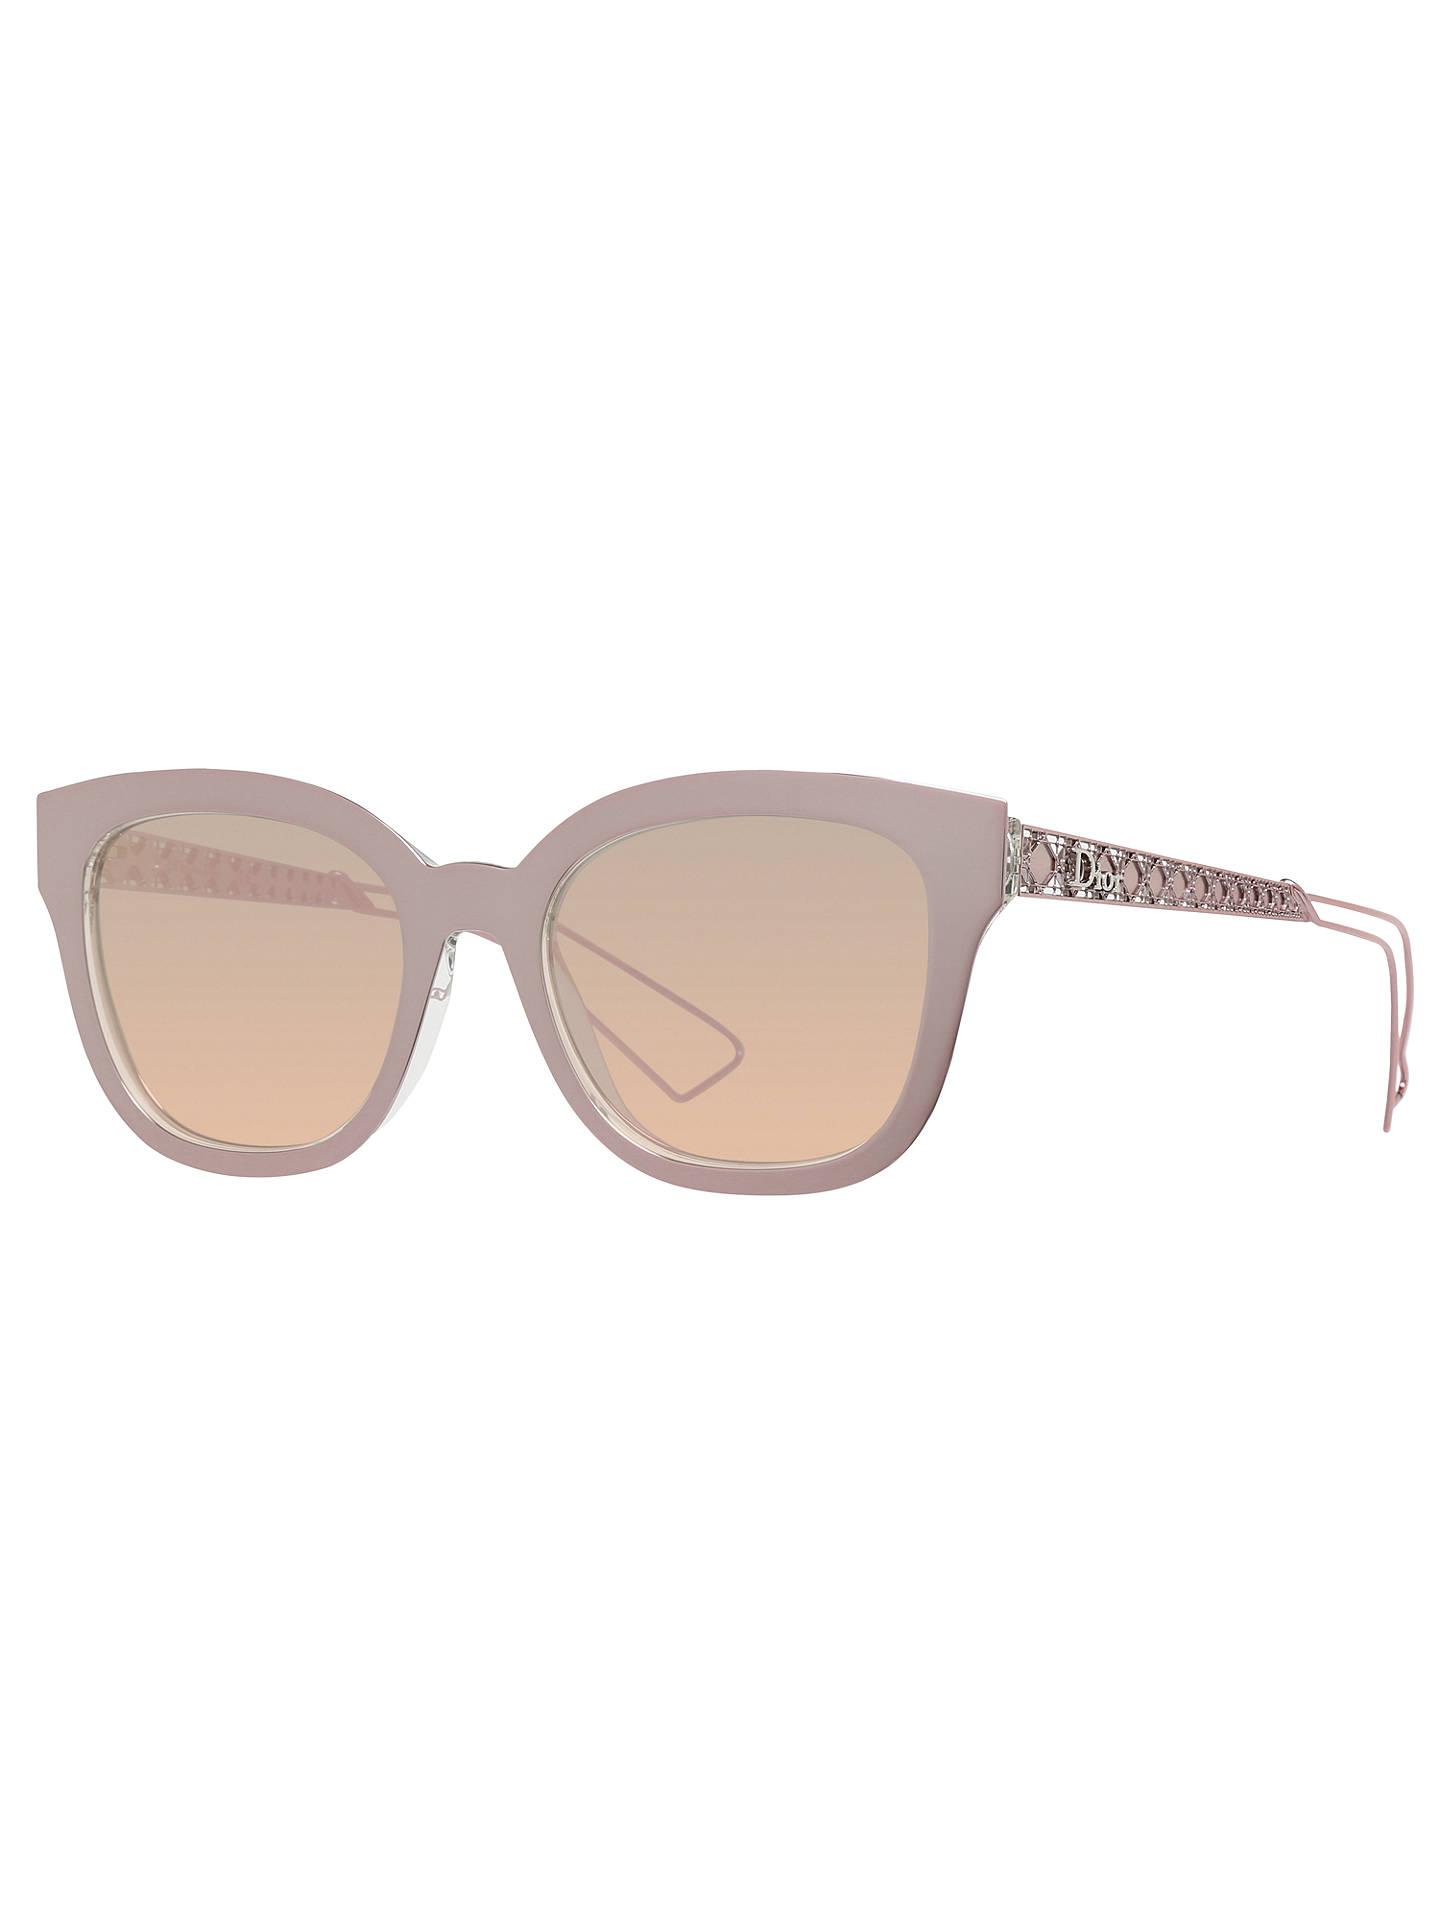 295f15713c BuyDior Diorama1 Embellished Cat s Eye Sunglasses